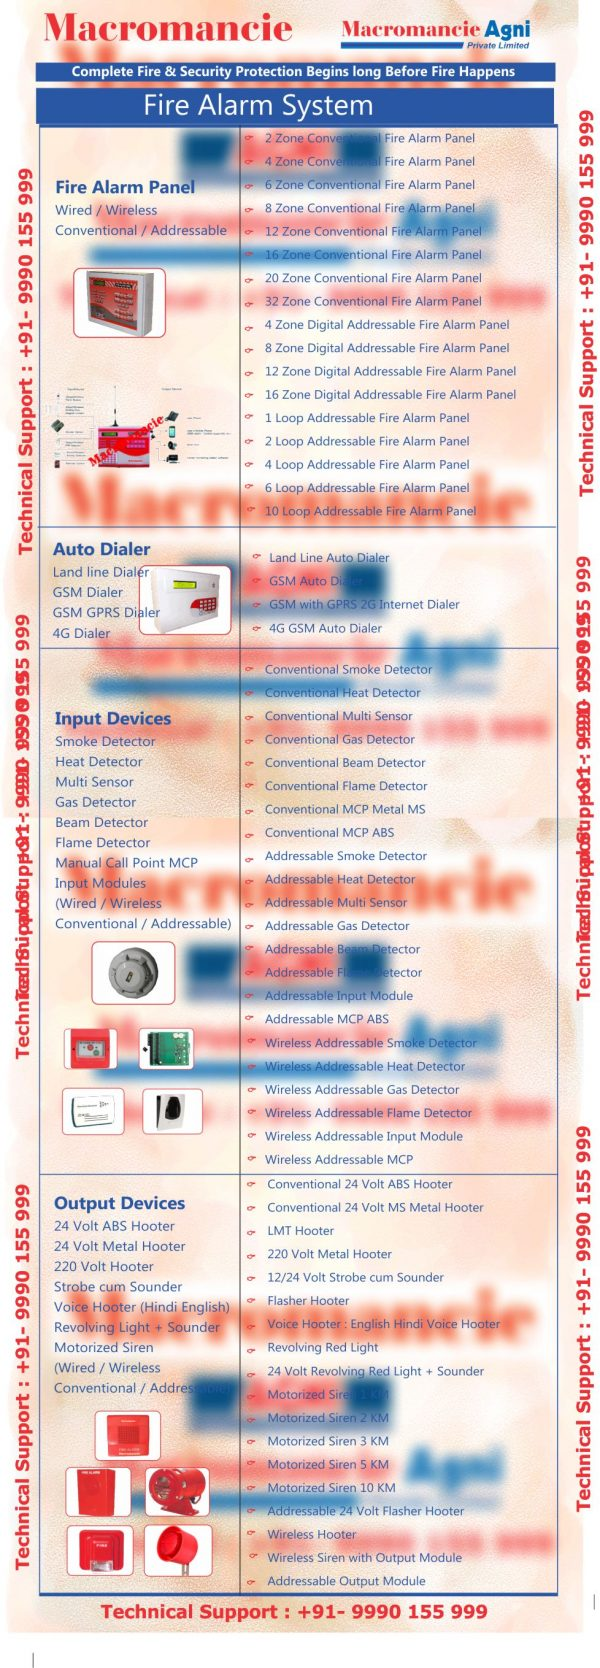 Macromancie_Agni_9990155999_Flame_Detector_for_Faster_Detecton (5)